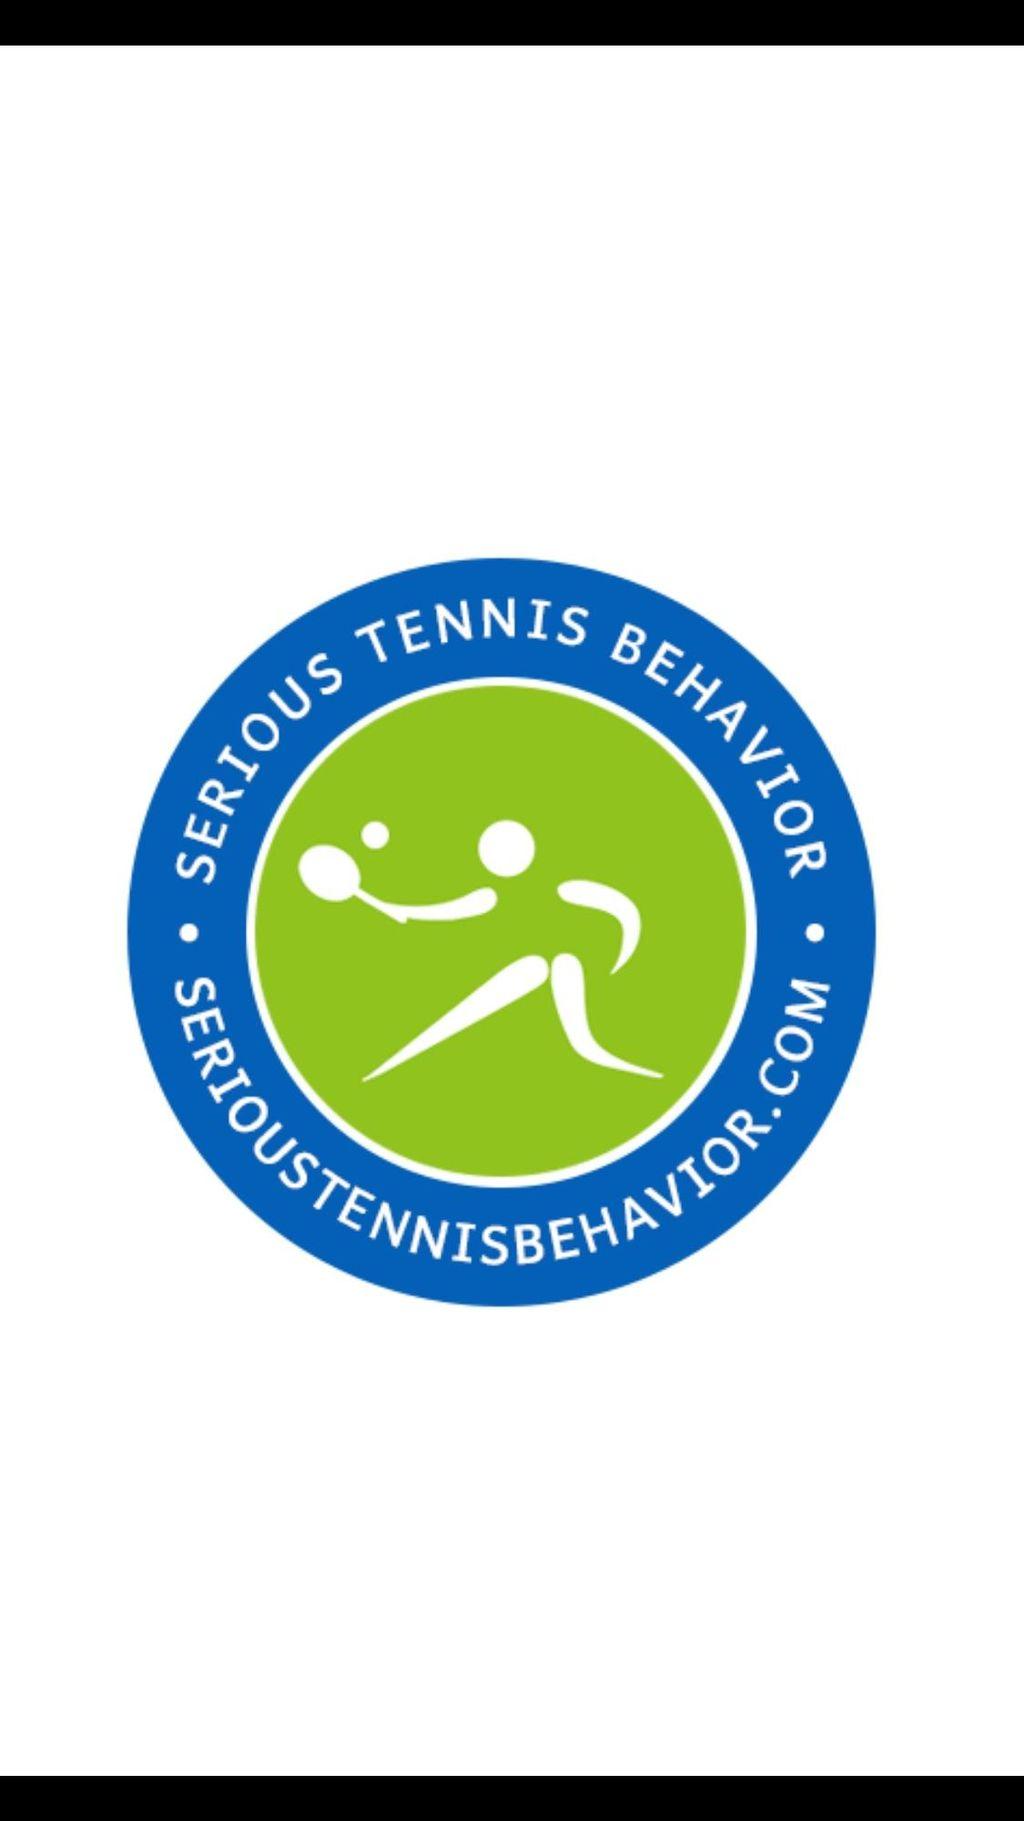 Serious Tennis Behavior